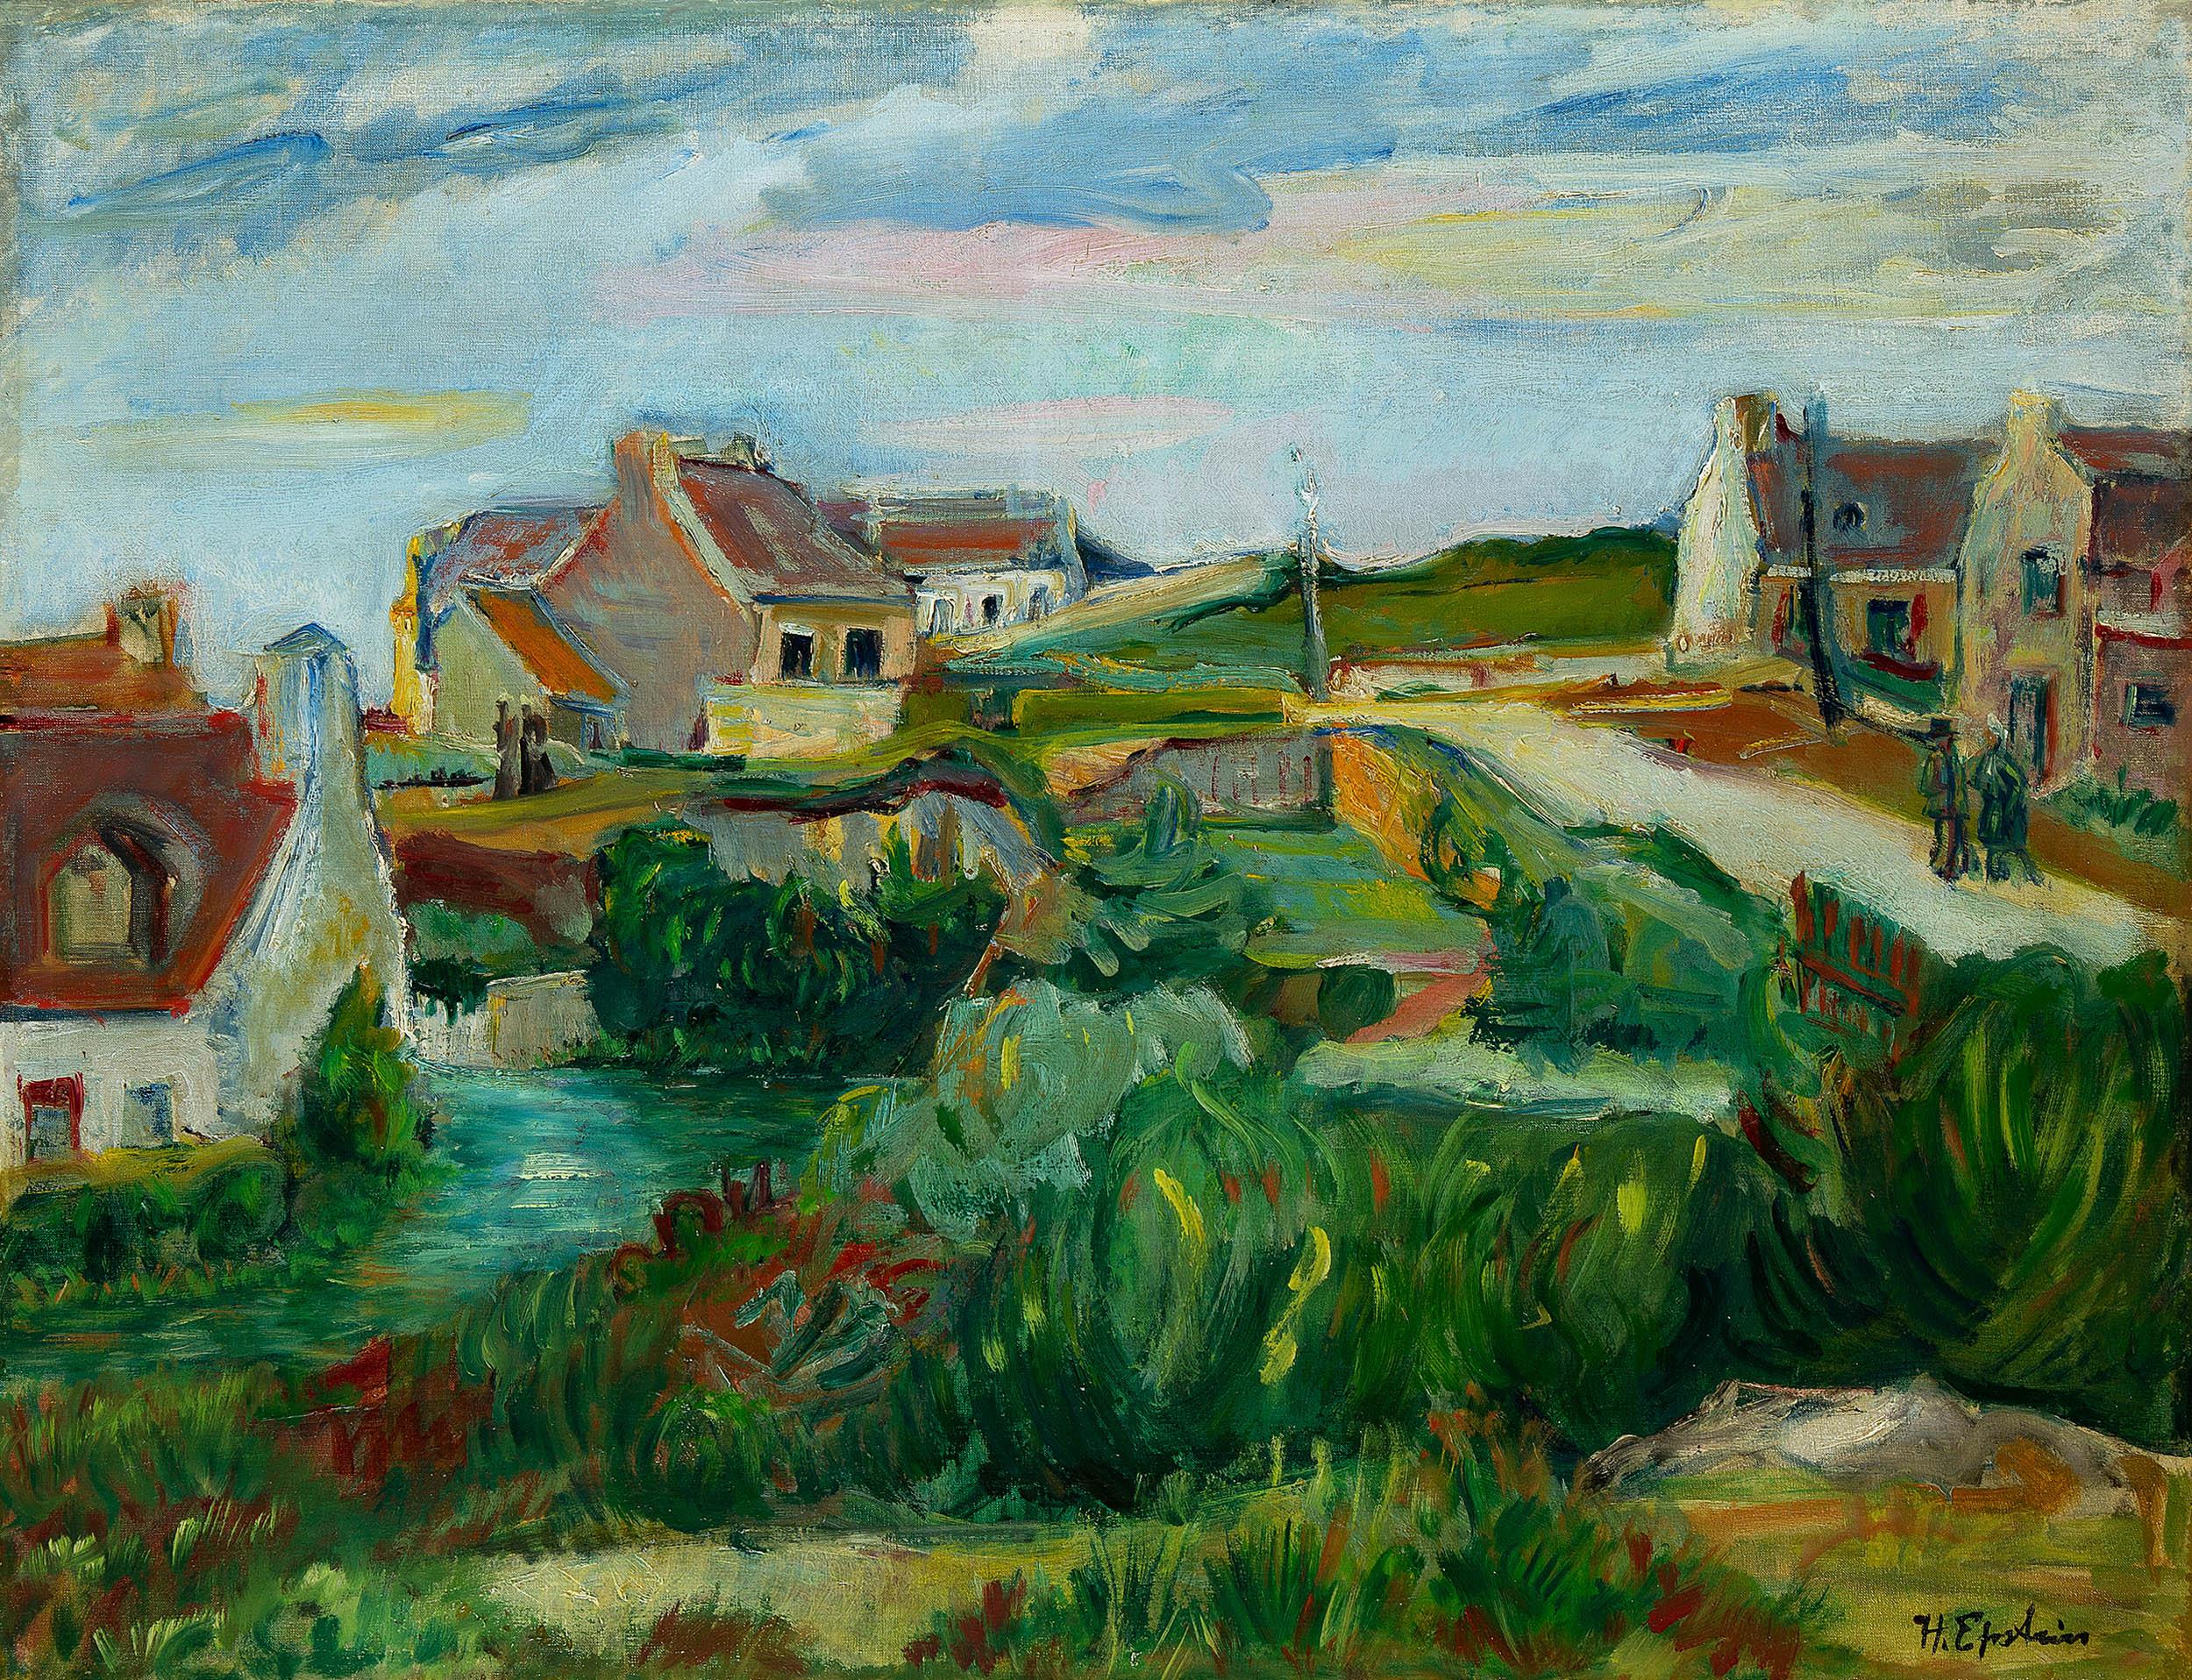 Wioska bretońska nad morzem